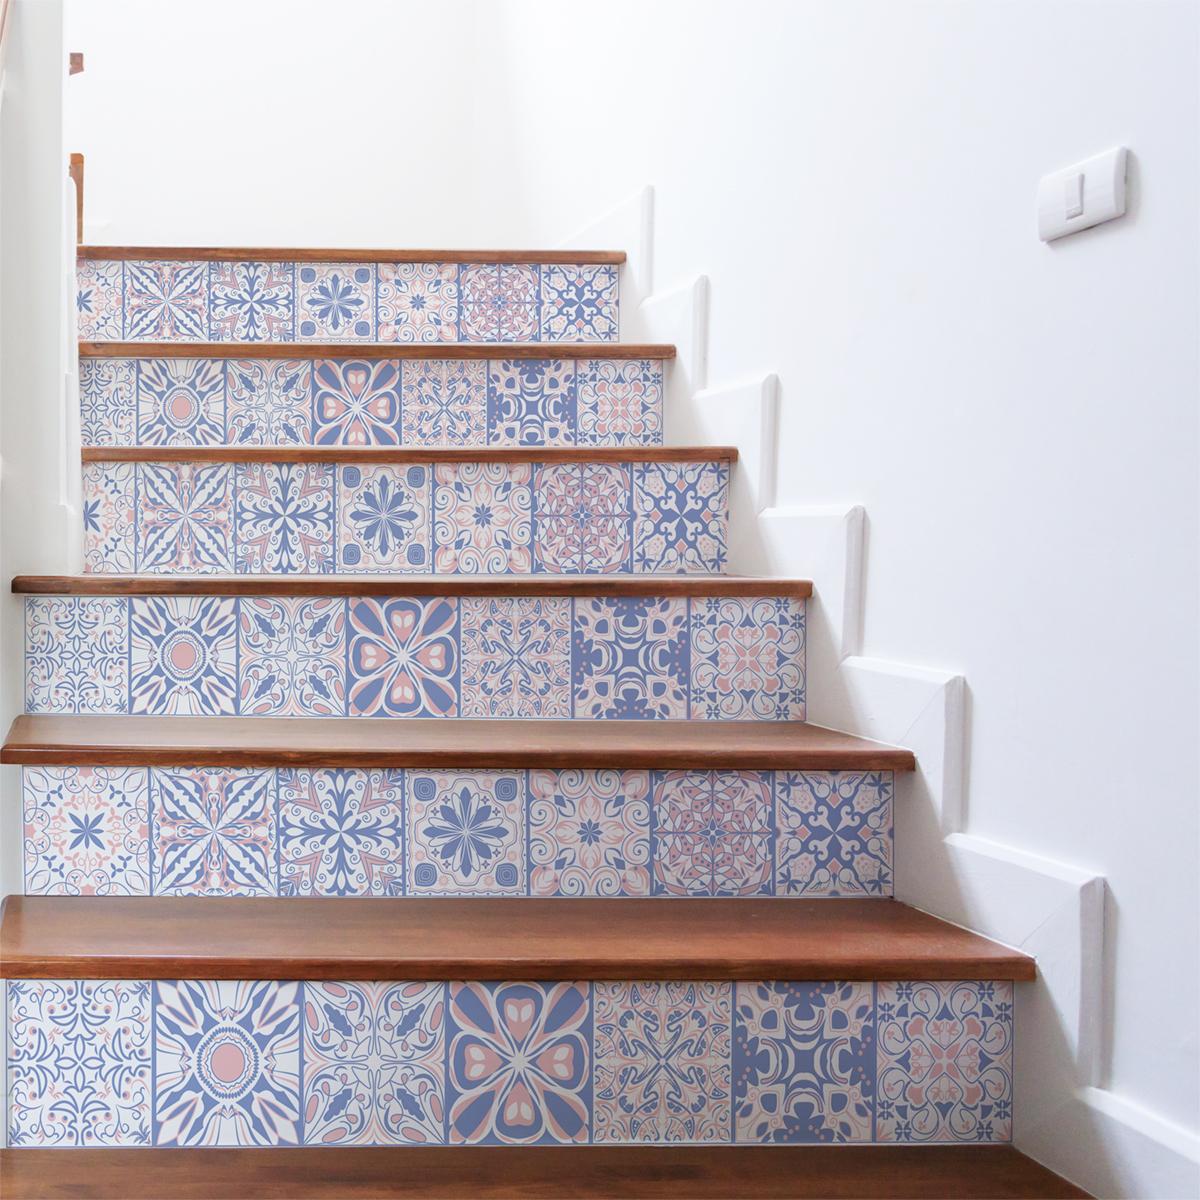 stickers contremarche bleu d 39 orient x 2 stickers carrelage stickers carrelage escalier. Black Bedroom Furniture Sets. Home Design Ideas